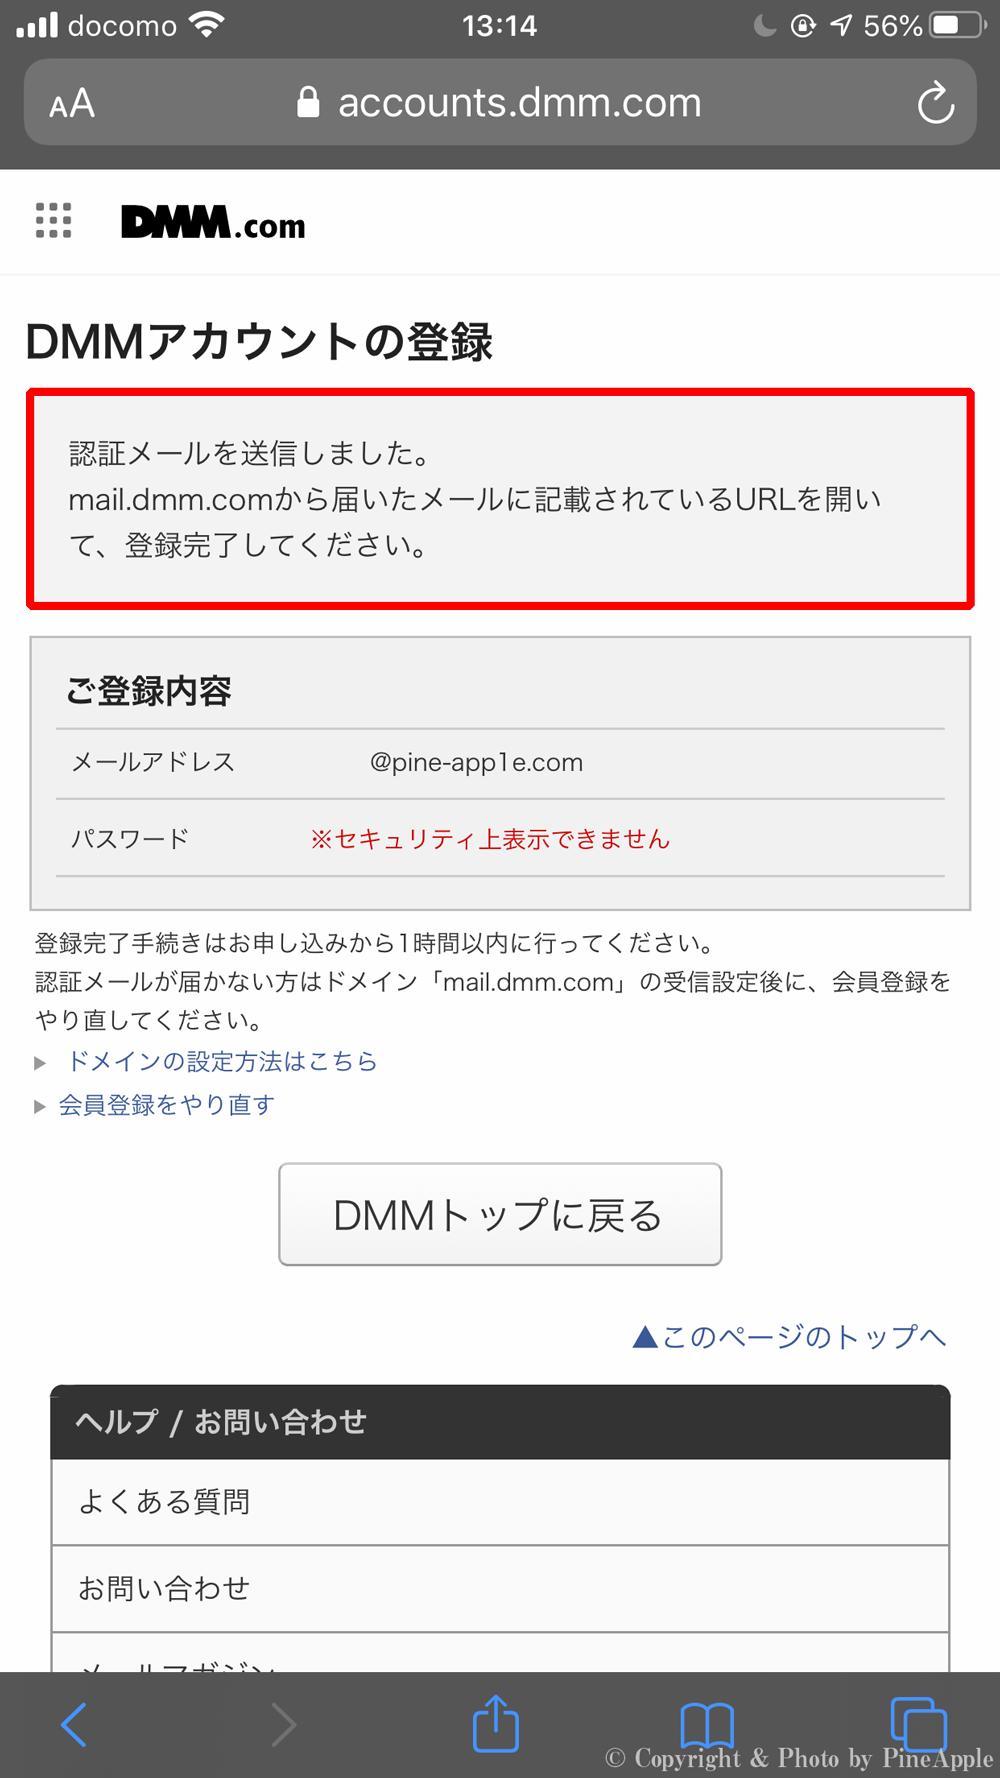 DMM アカウント:登録メールアドレス宛に「認証メール」が送信